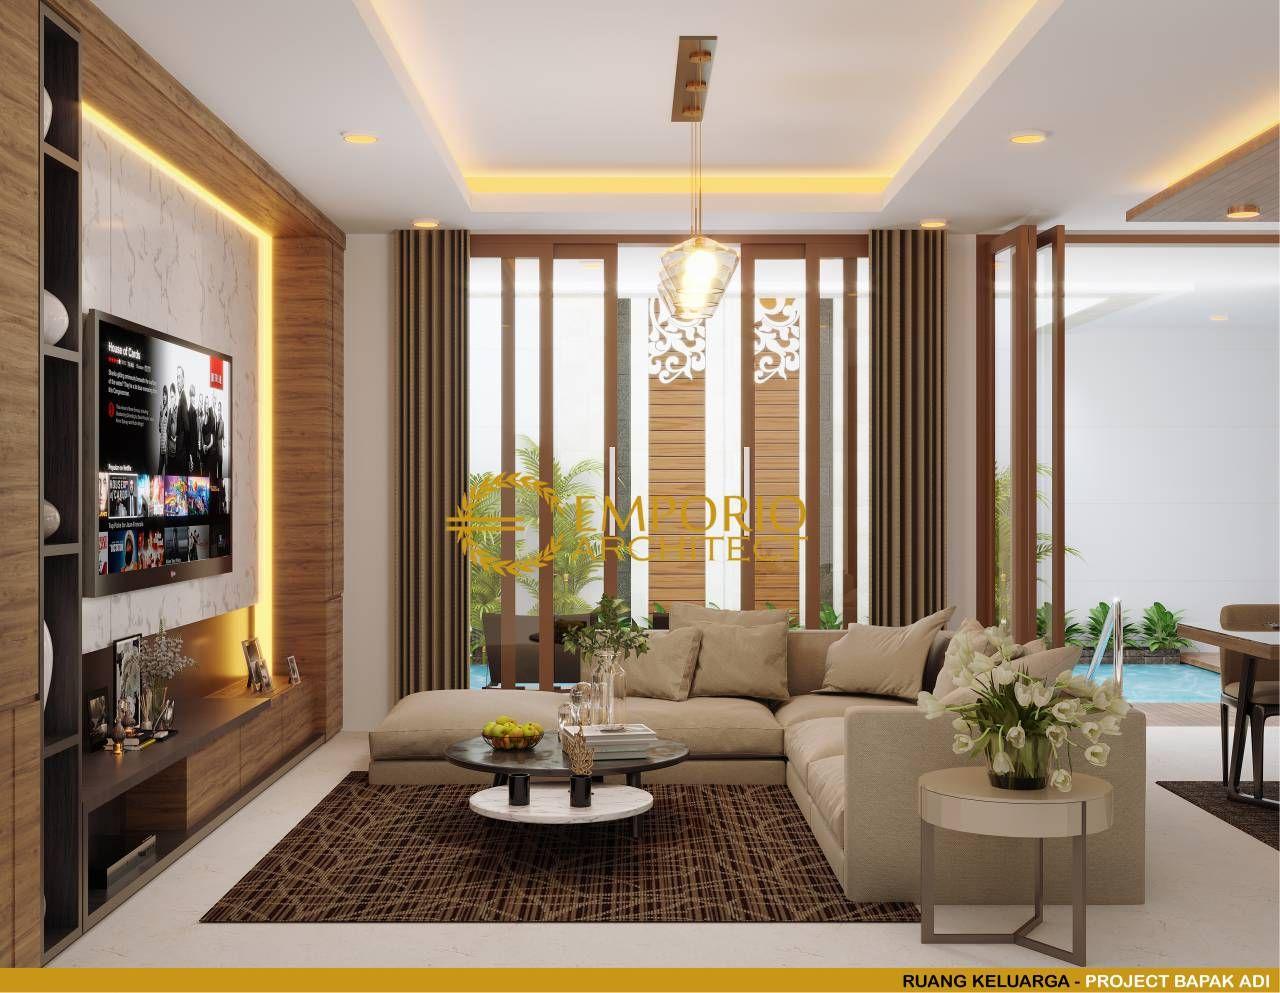 Mr Adi Modern House 2 Floors Design Bogor Jawa Barat Living Room Design Small Spaces Modern Bedroom Interior Floor Design Home design living room modern